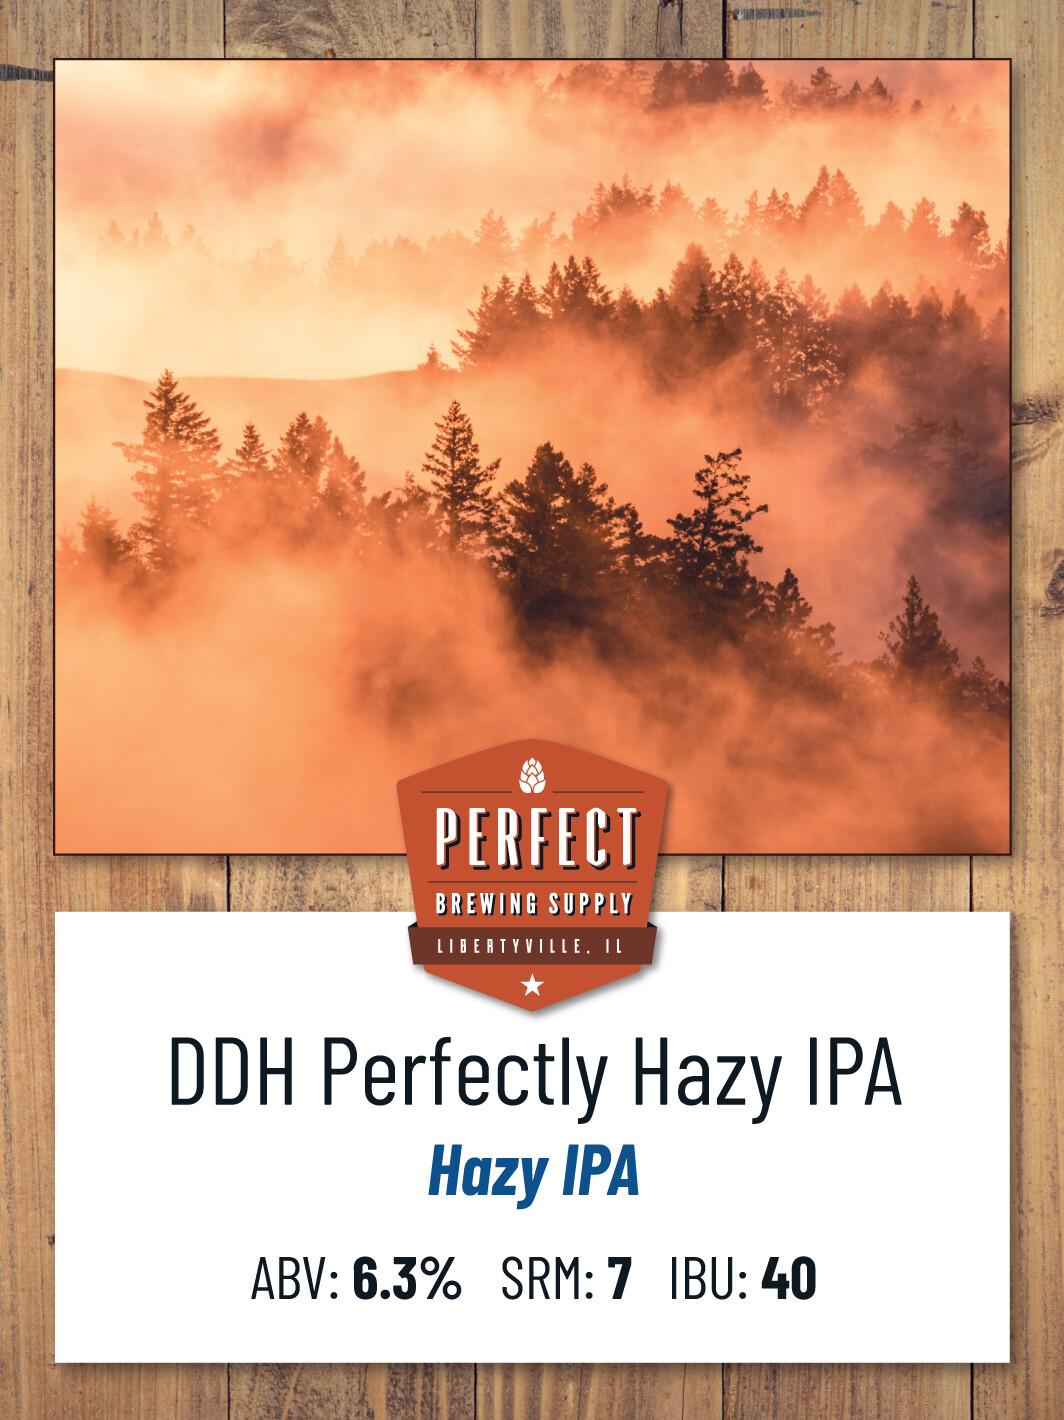 DDH Perfectly Hazy IPA- PBS Kit